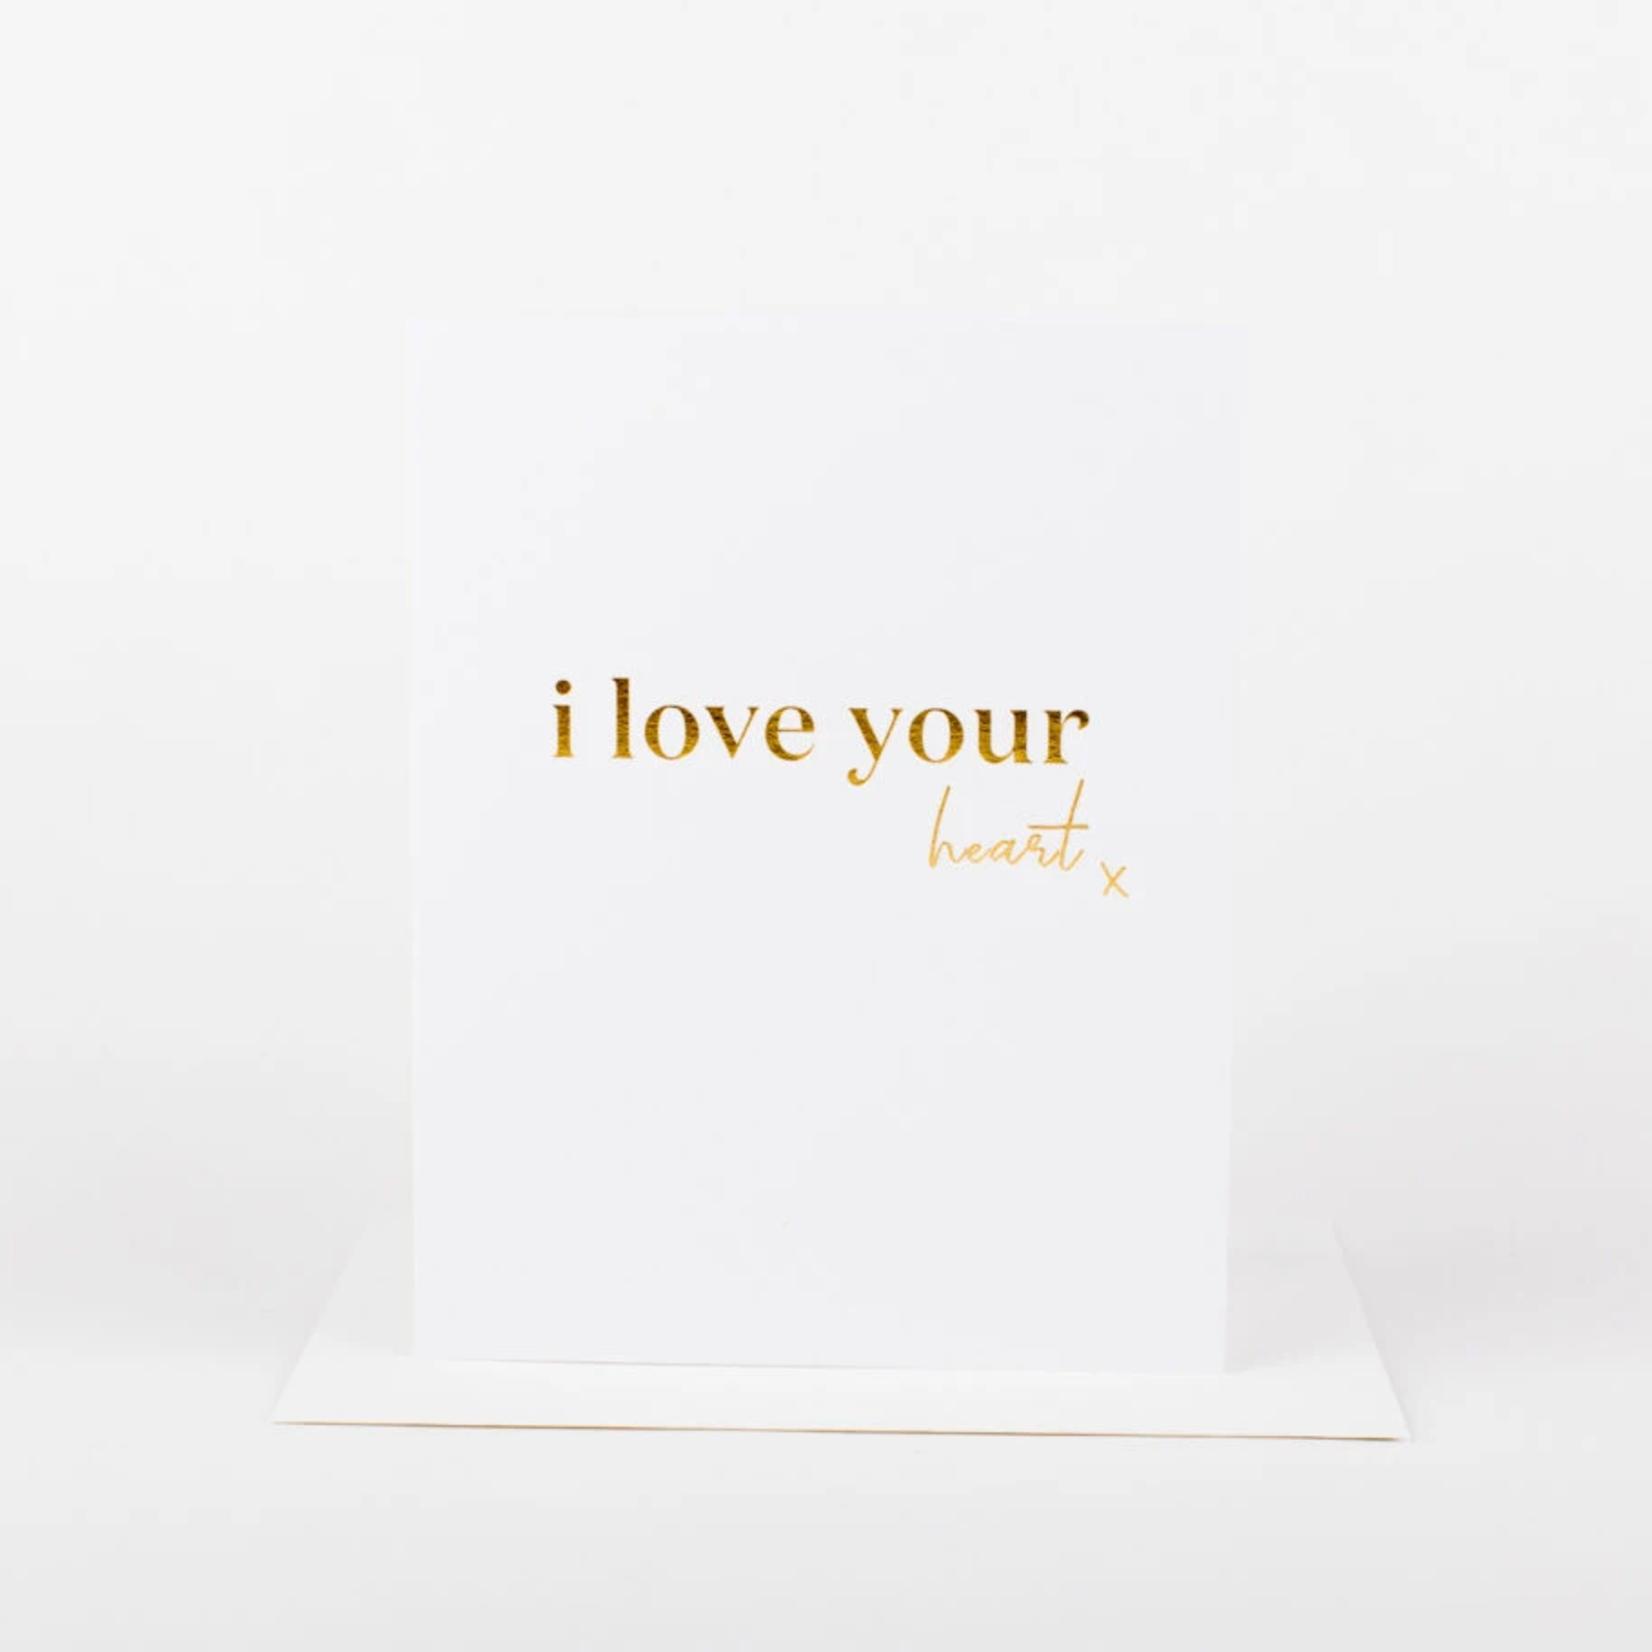 i love your heart x card